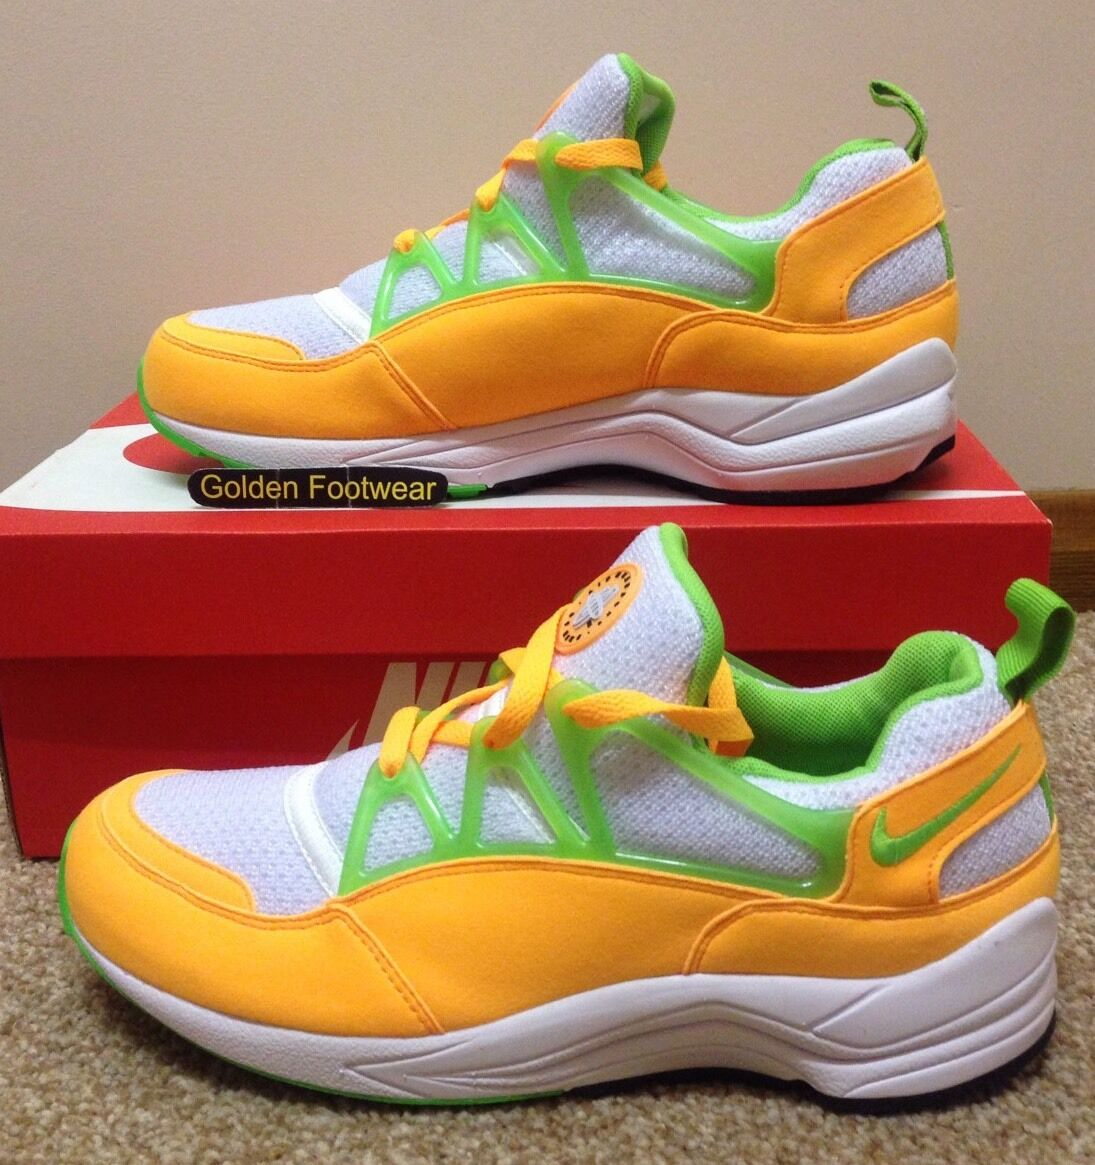 Nike Air Huarache Light Größe 7 UK, BNIB, Sunshine Sunshine Sunshine Editions, cb191d